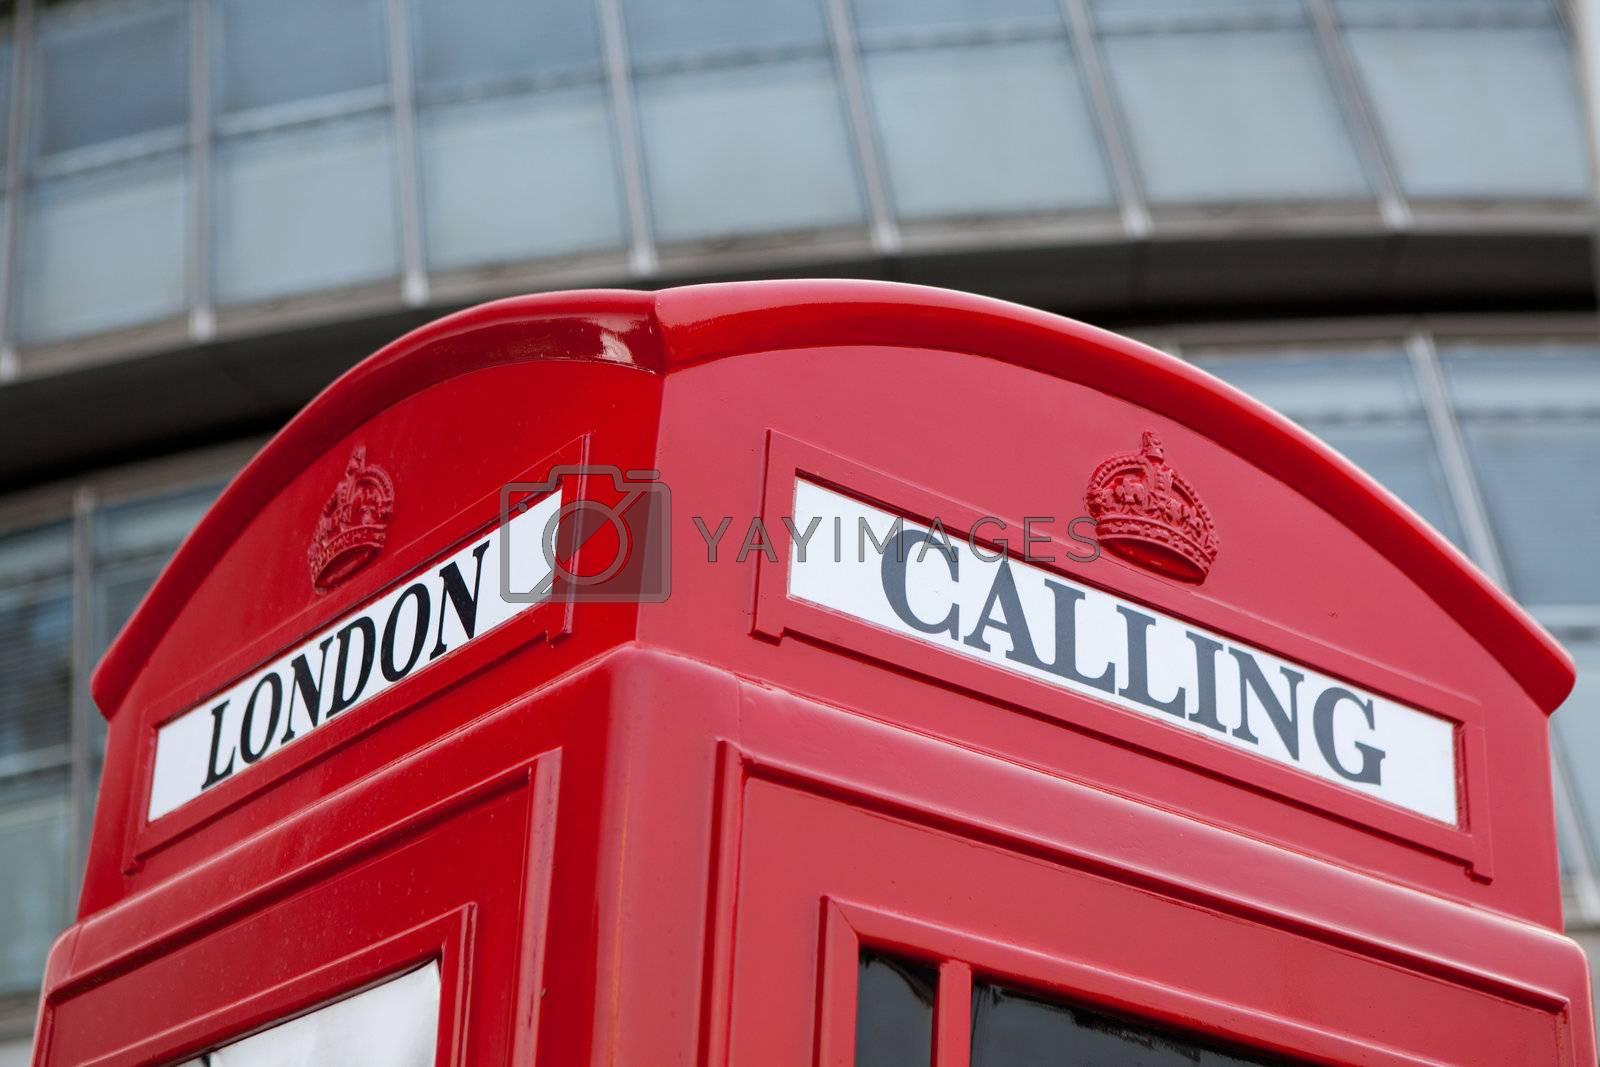 London symbol red public phone box on facade background by SergeyAK